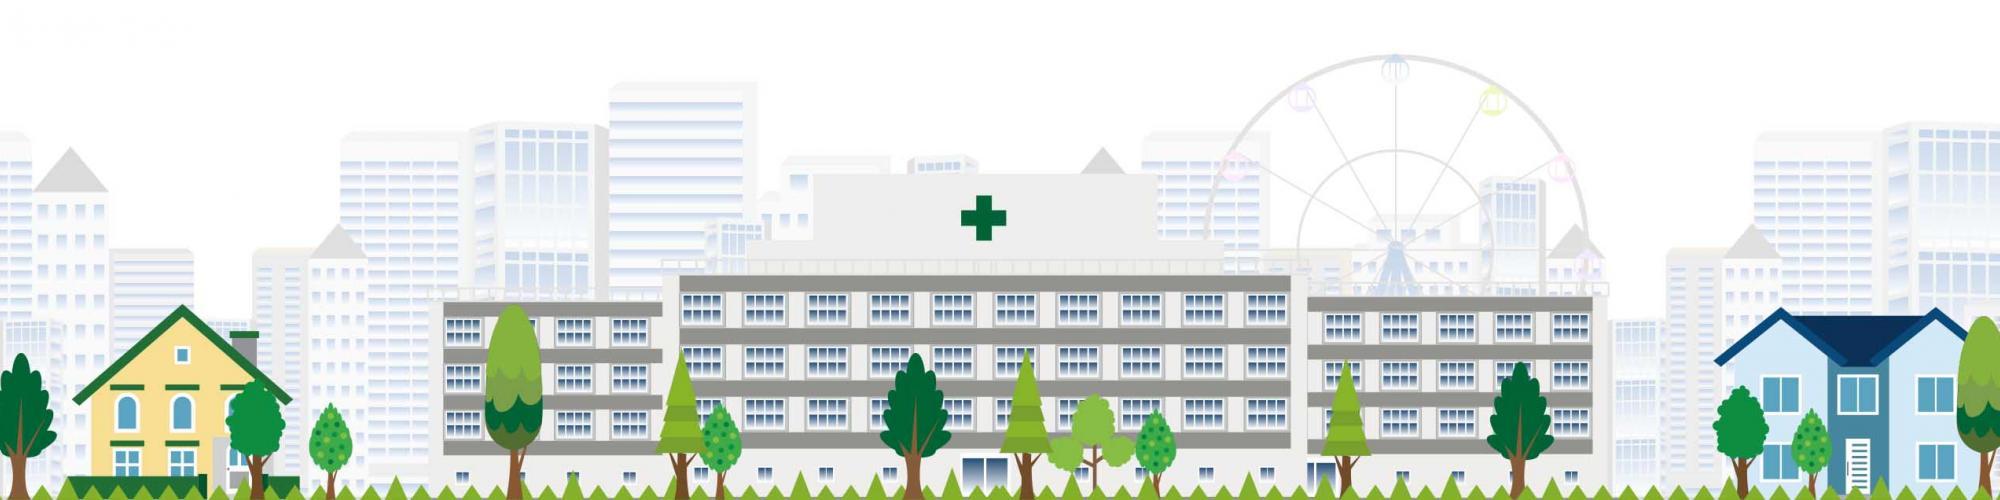 Bioscientia Institut für Medizinische Diagnostik GmbH